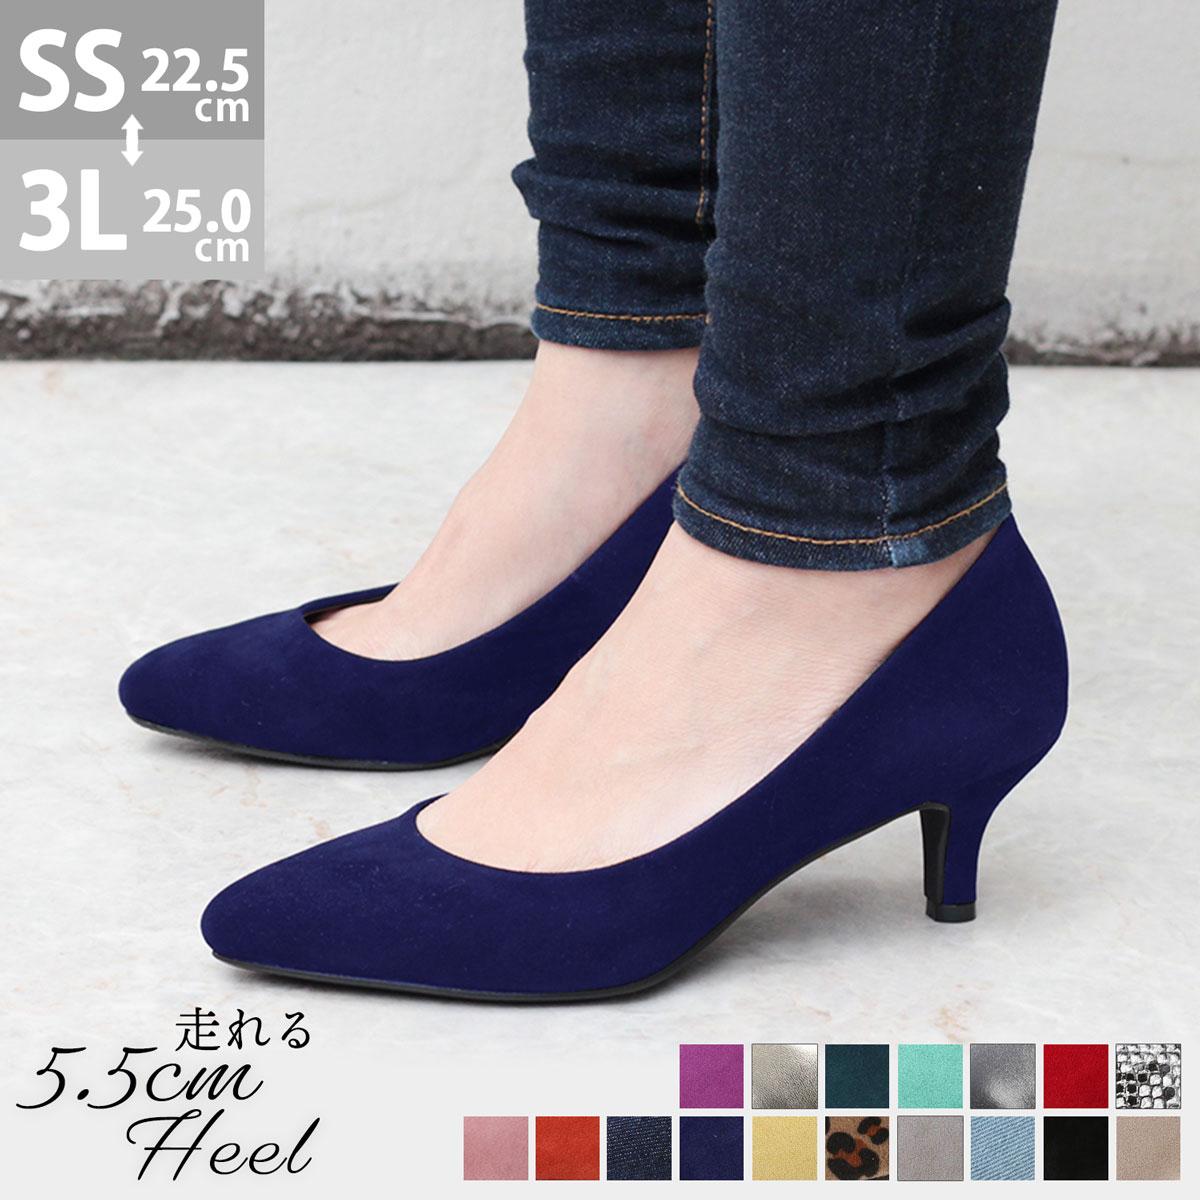 【Libertydoll】スエードパンプス 5.5cmヒール 5415 全5色